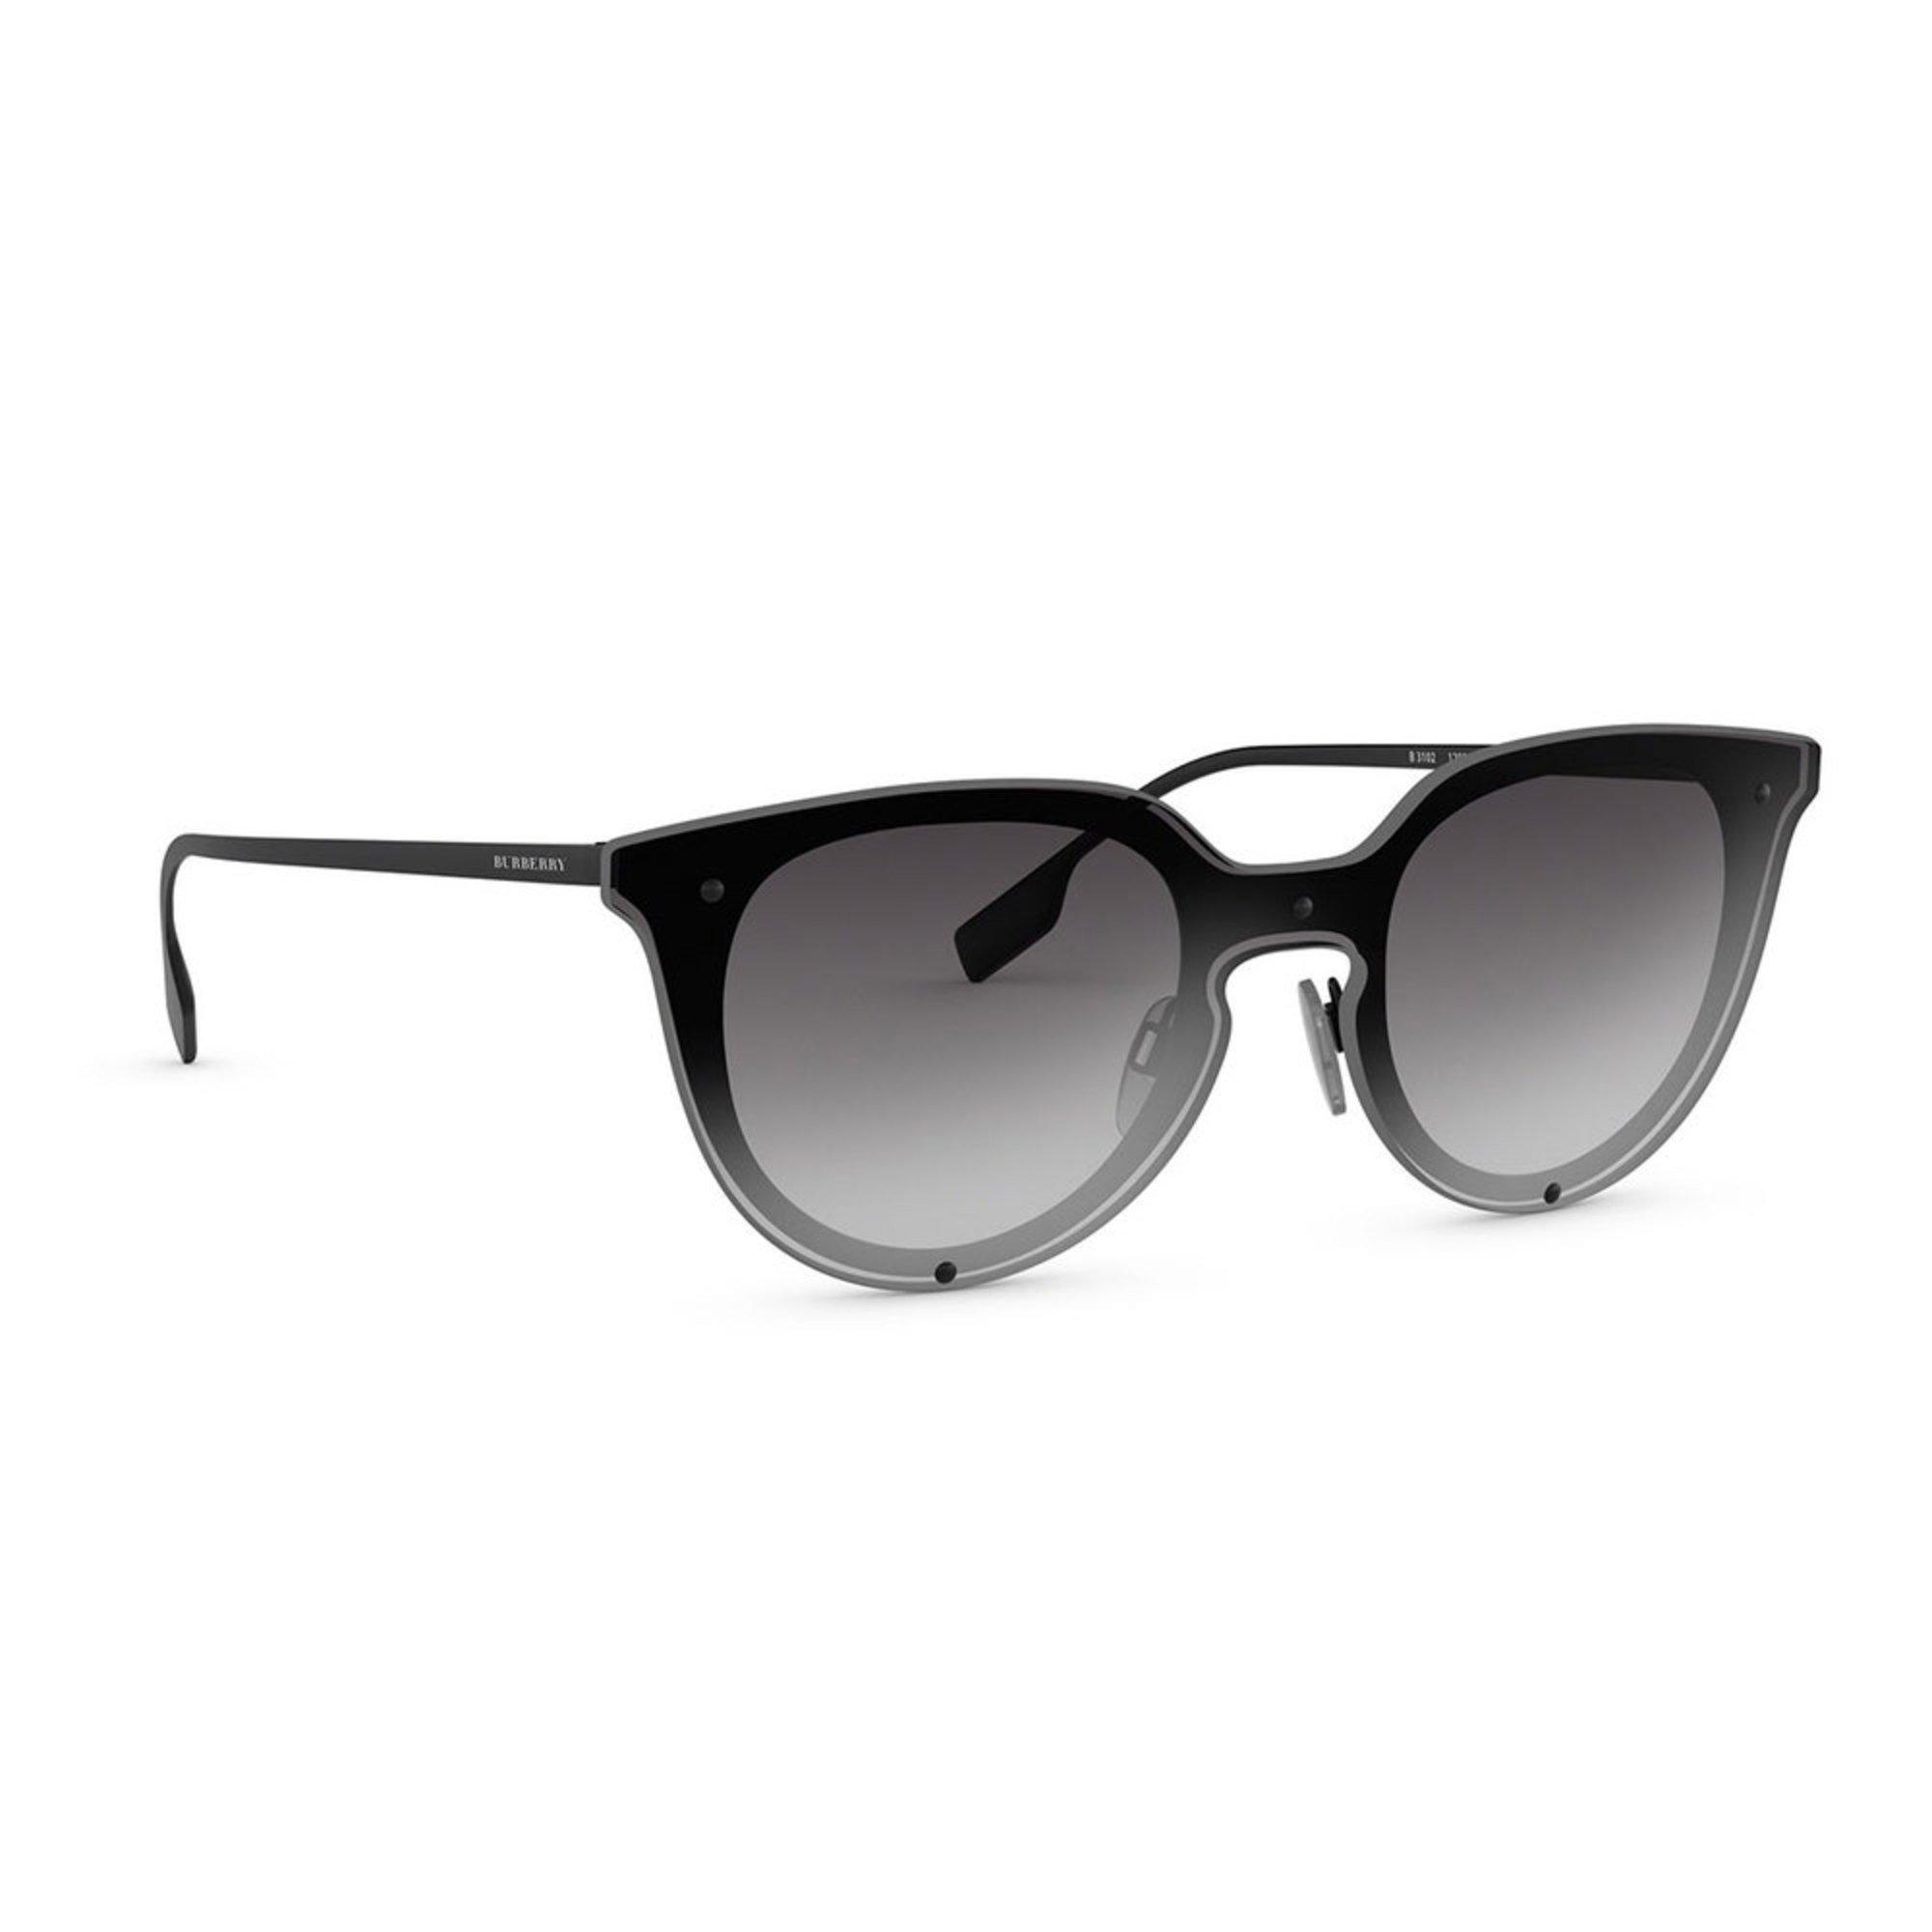 92d89d3519e6 Burberry Women s Black Rubber Sunglasses 39mm